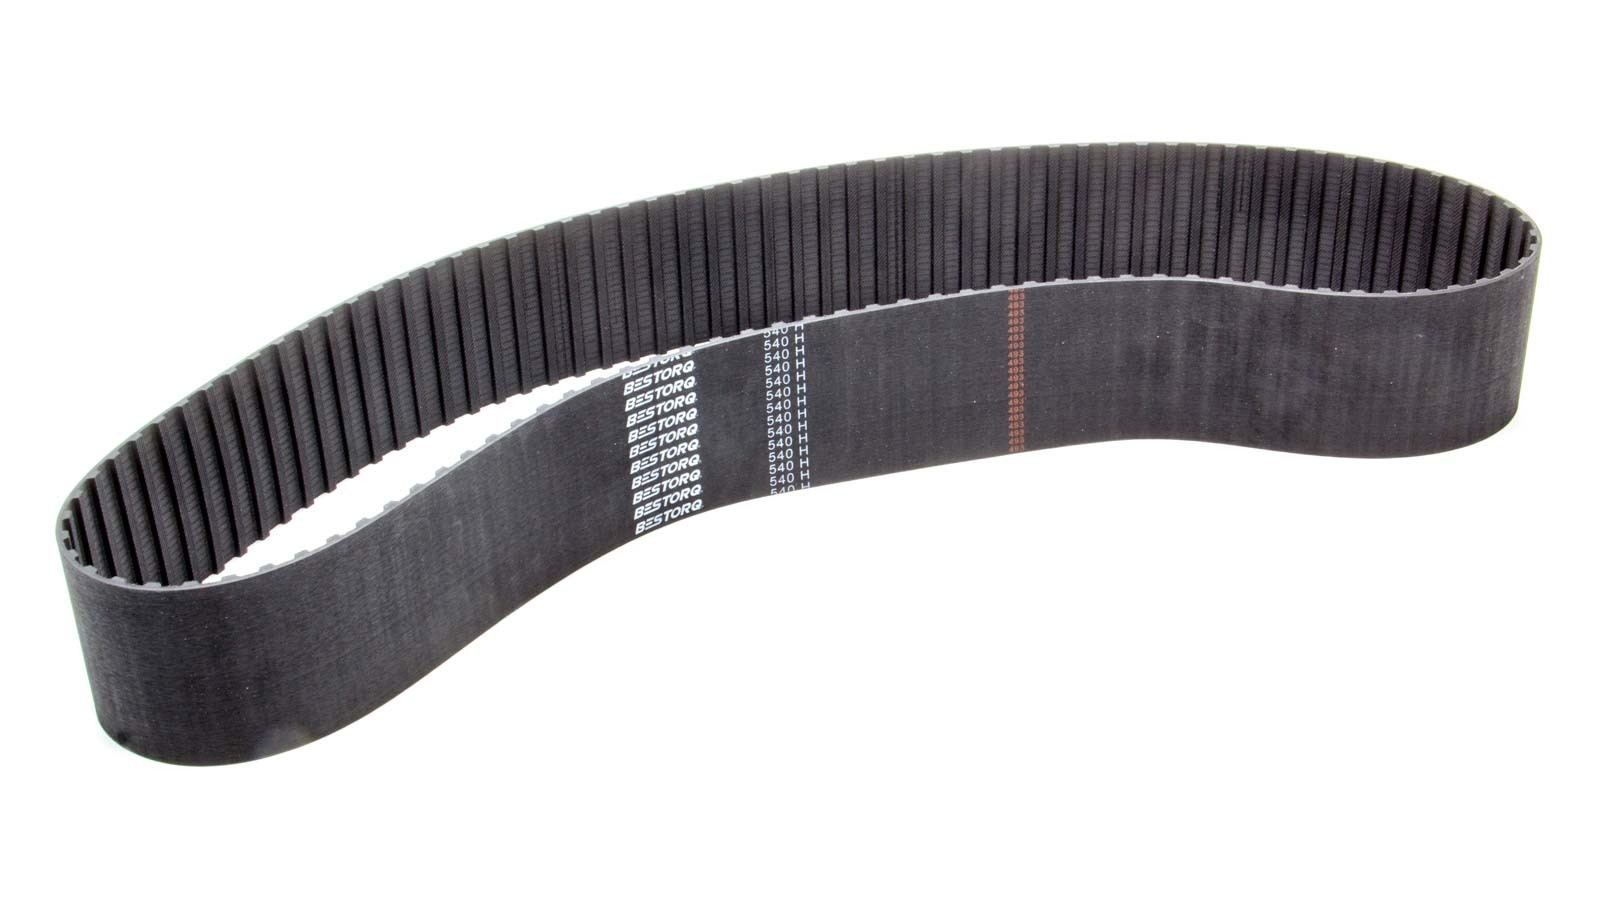 Blower Belt - 117T 58.5 x 3 - 1/2 Pitch